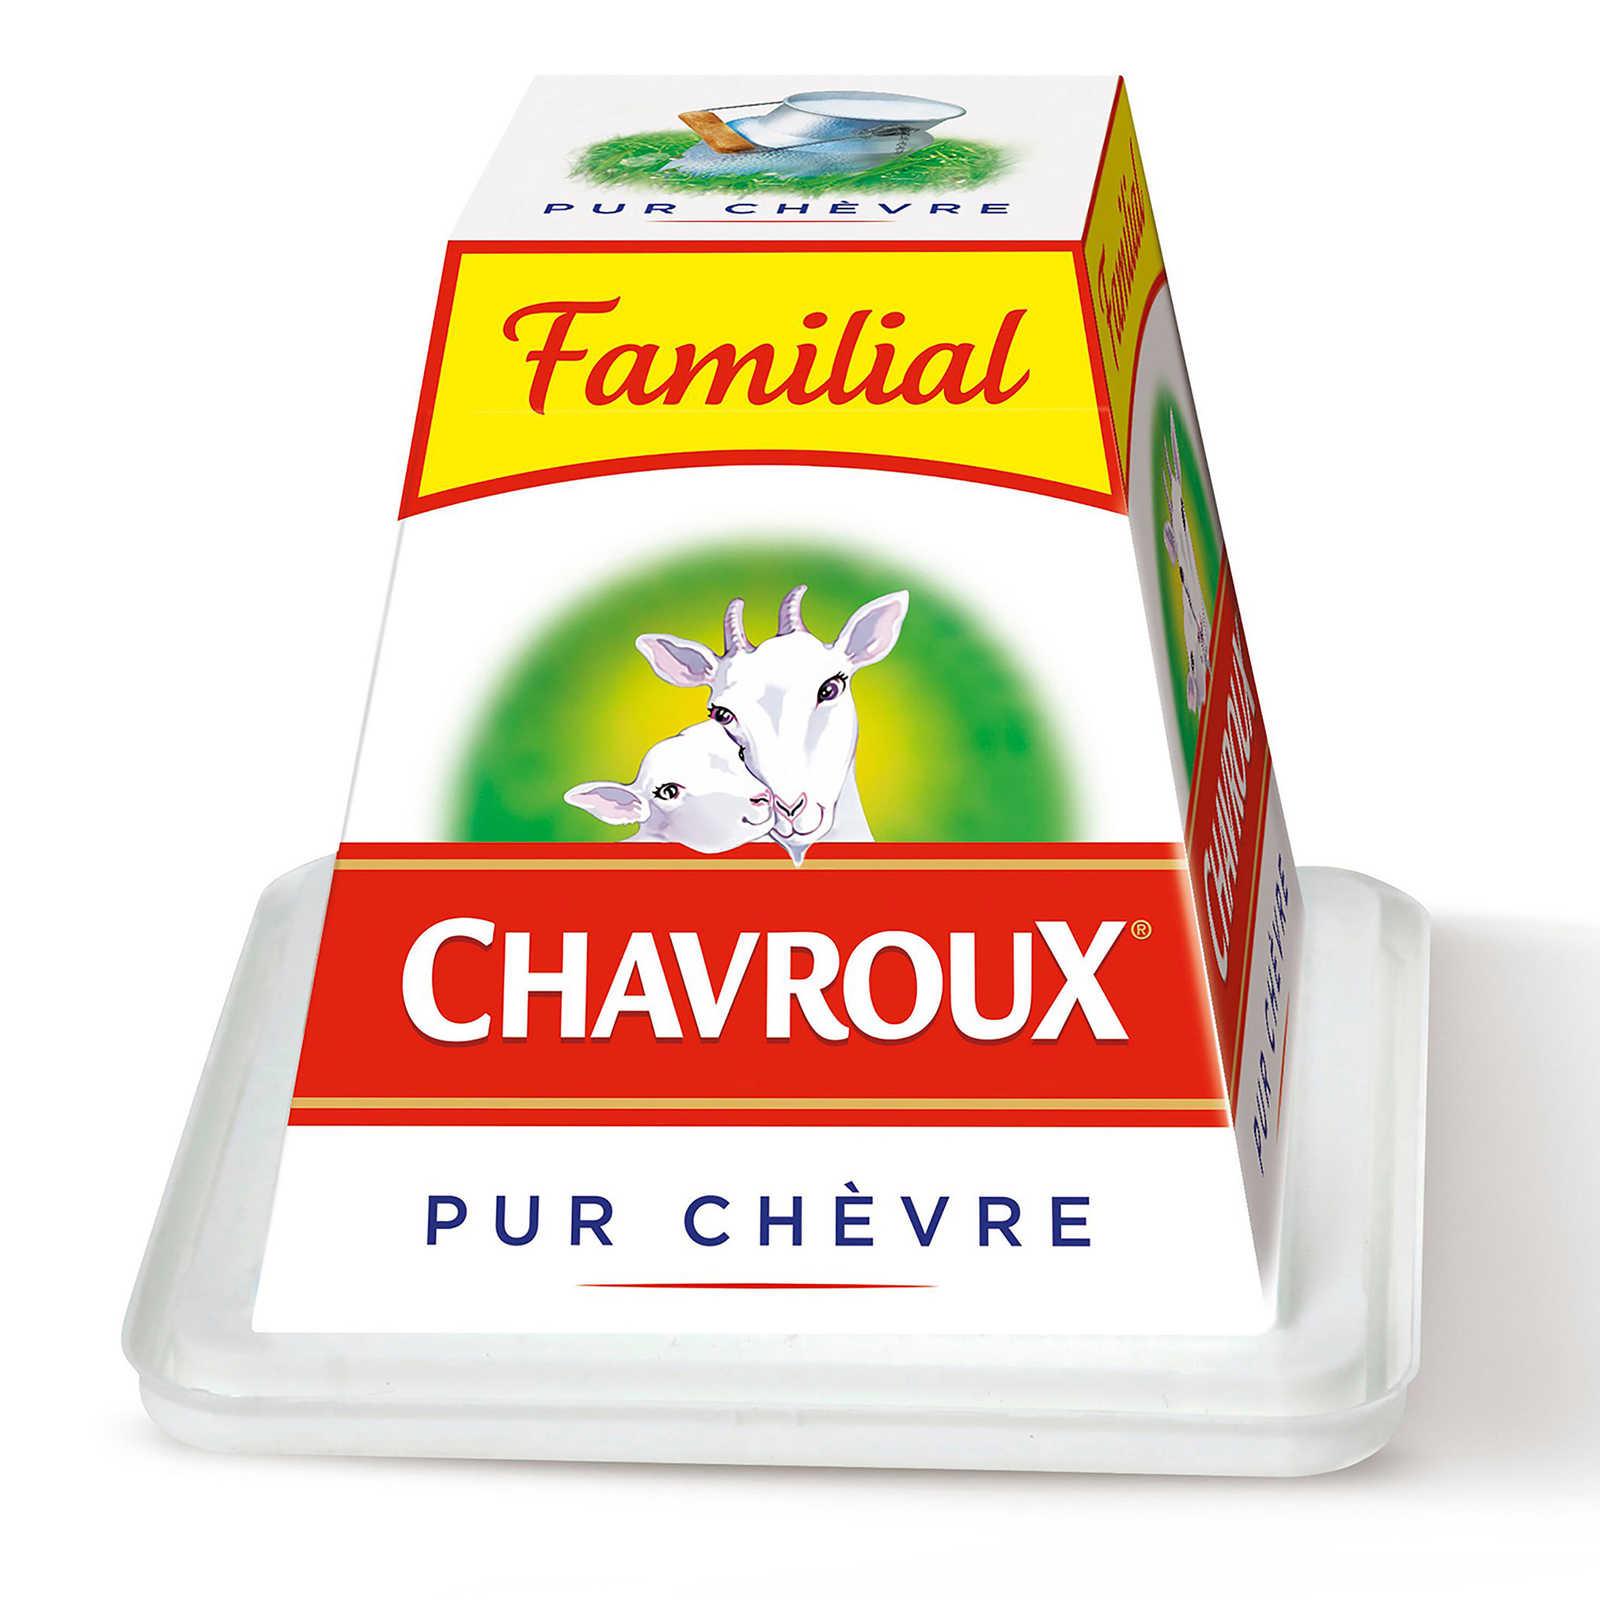 CHAVROUX-CHAVROUX 225G